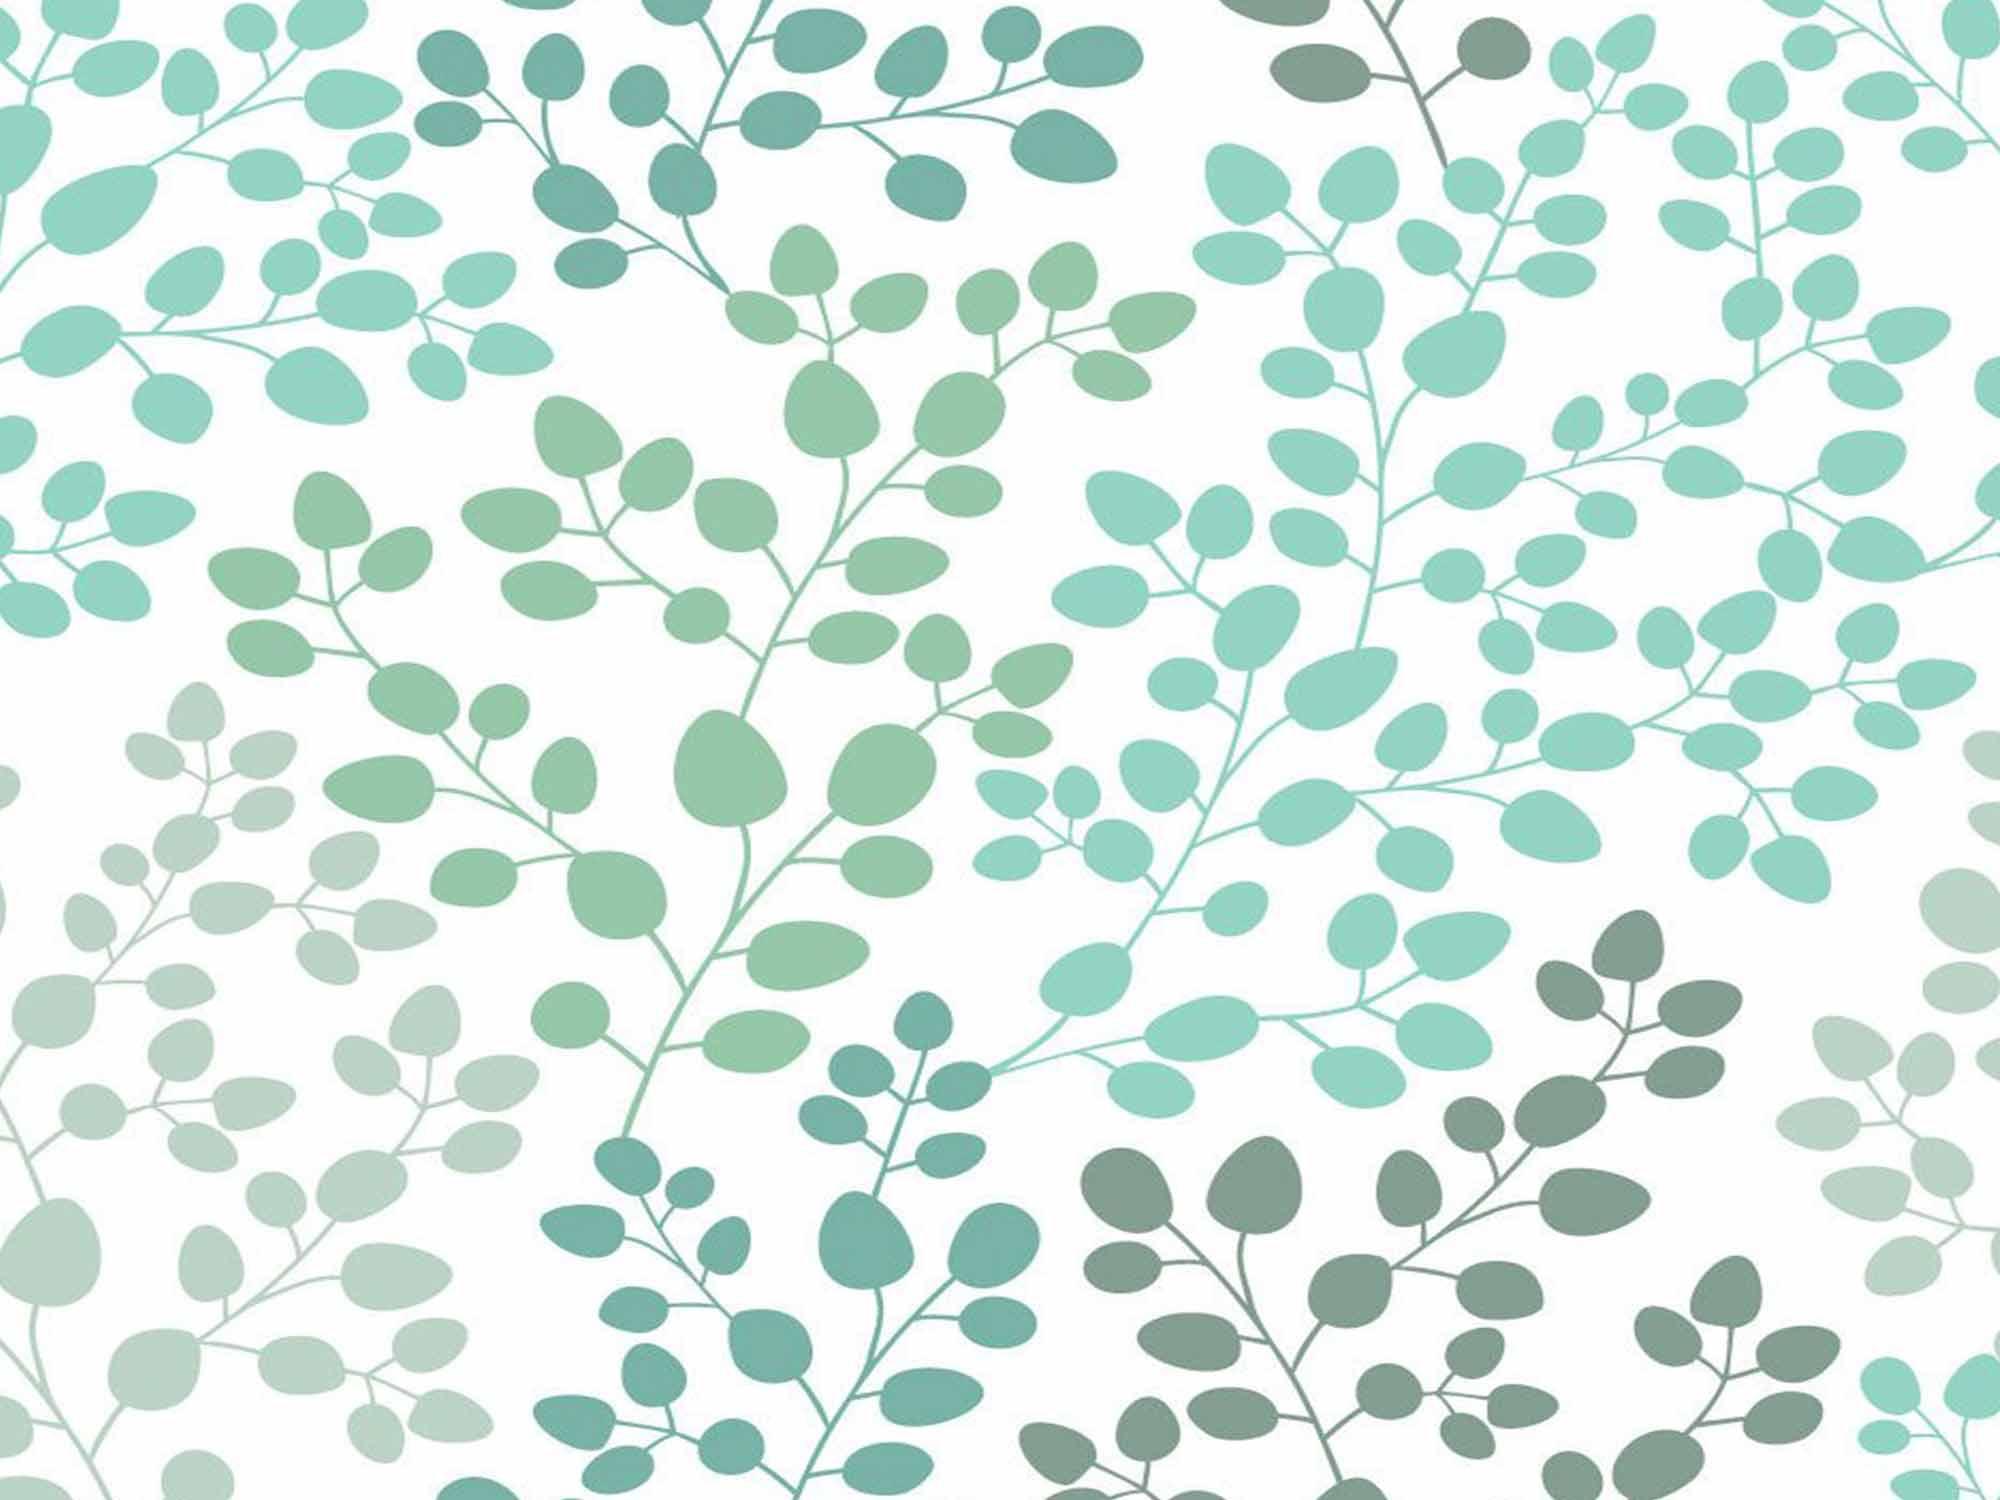 Papel de Parede Floral 0025 - Adesivos de Parede  - Paredes Decoradas